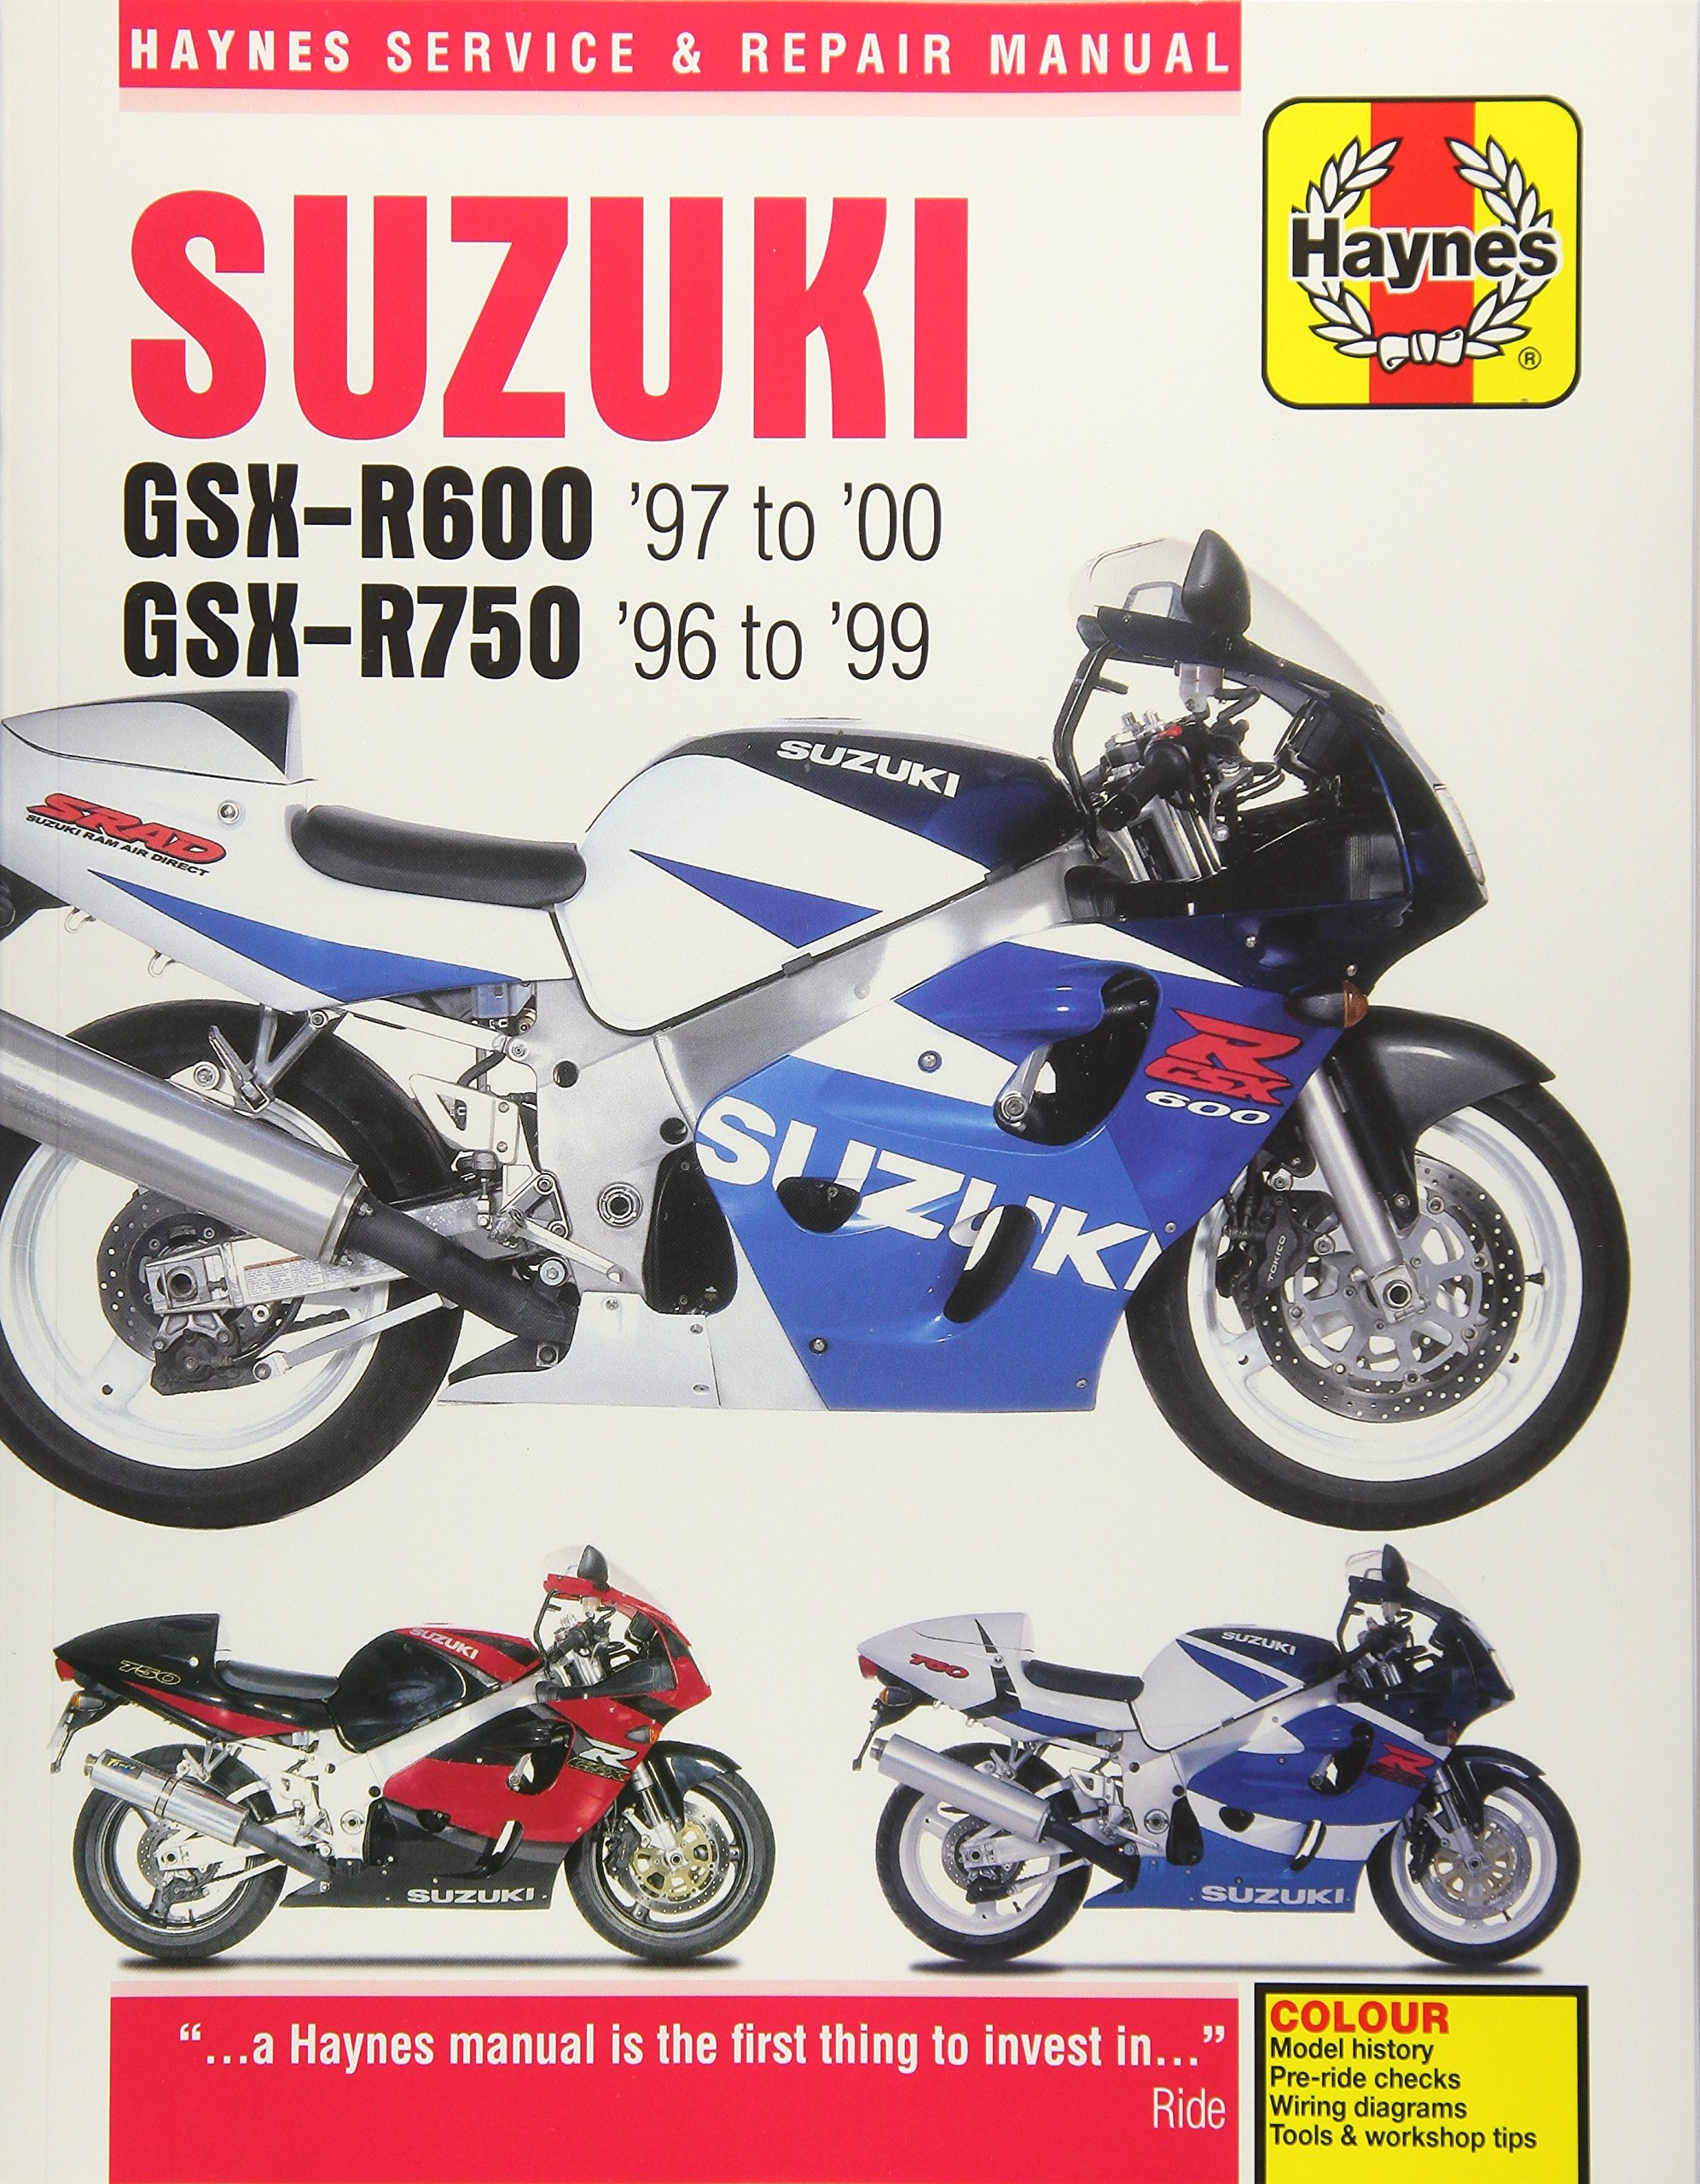 Suzuki Gsxr 1000 Wiring Diagram Color Images